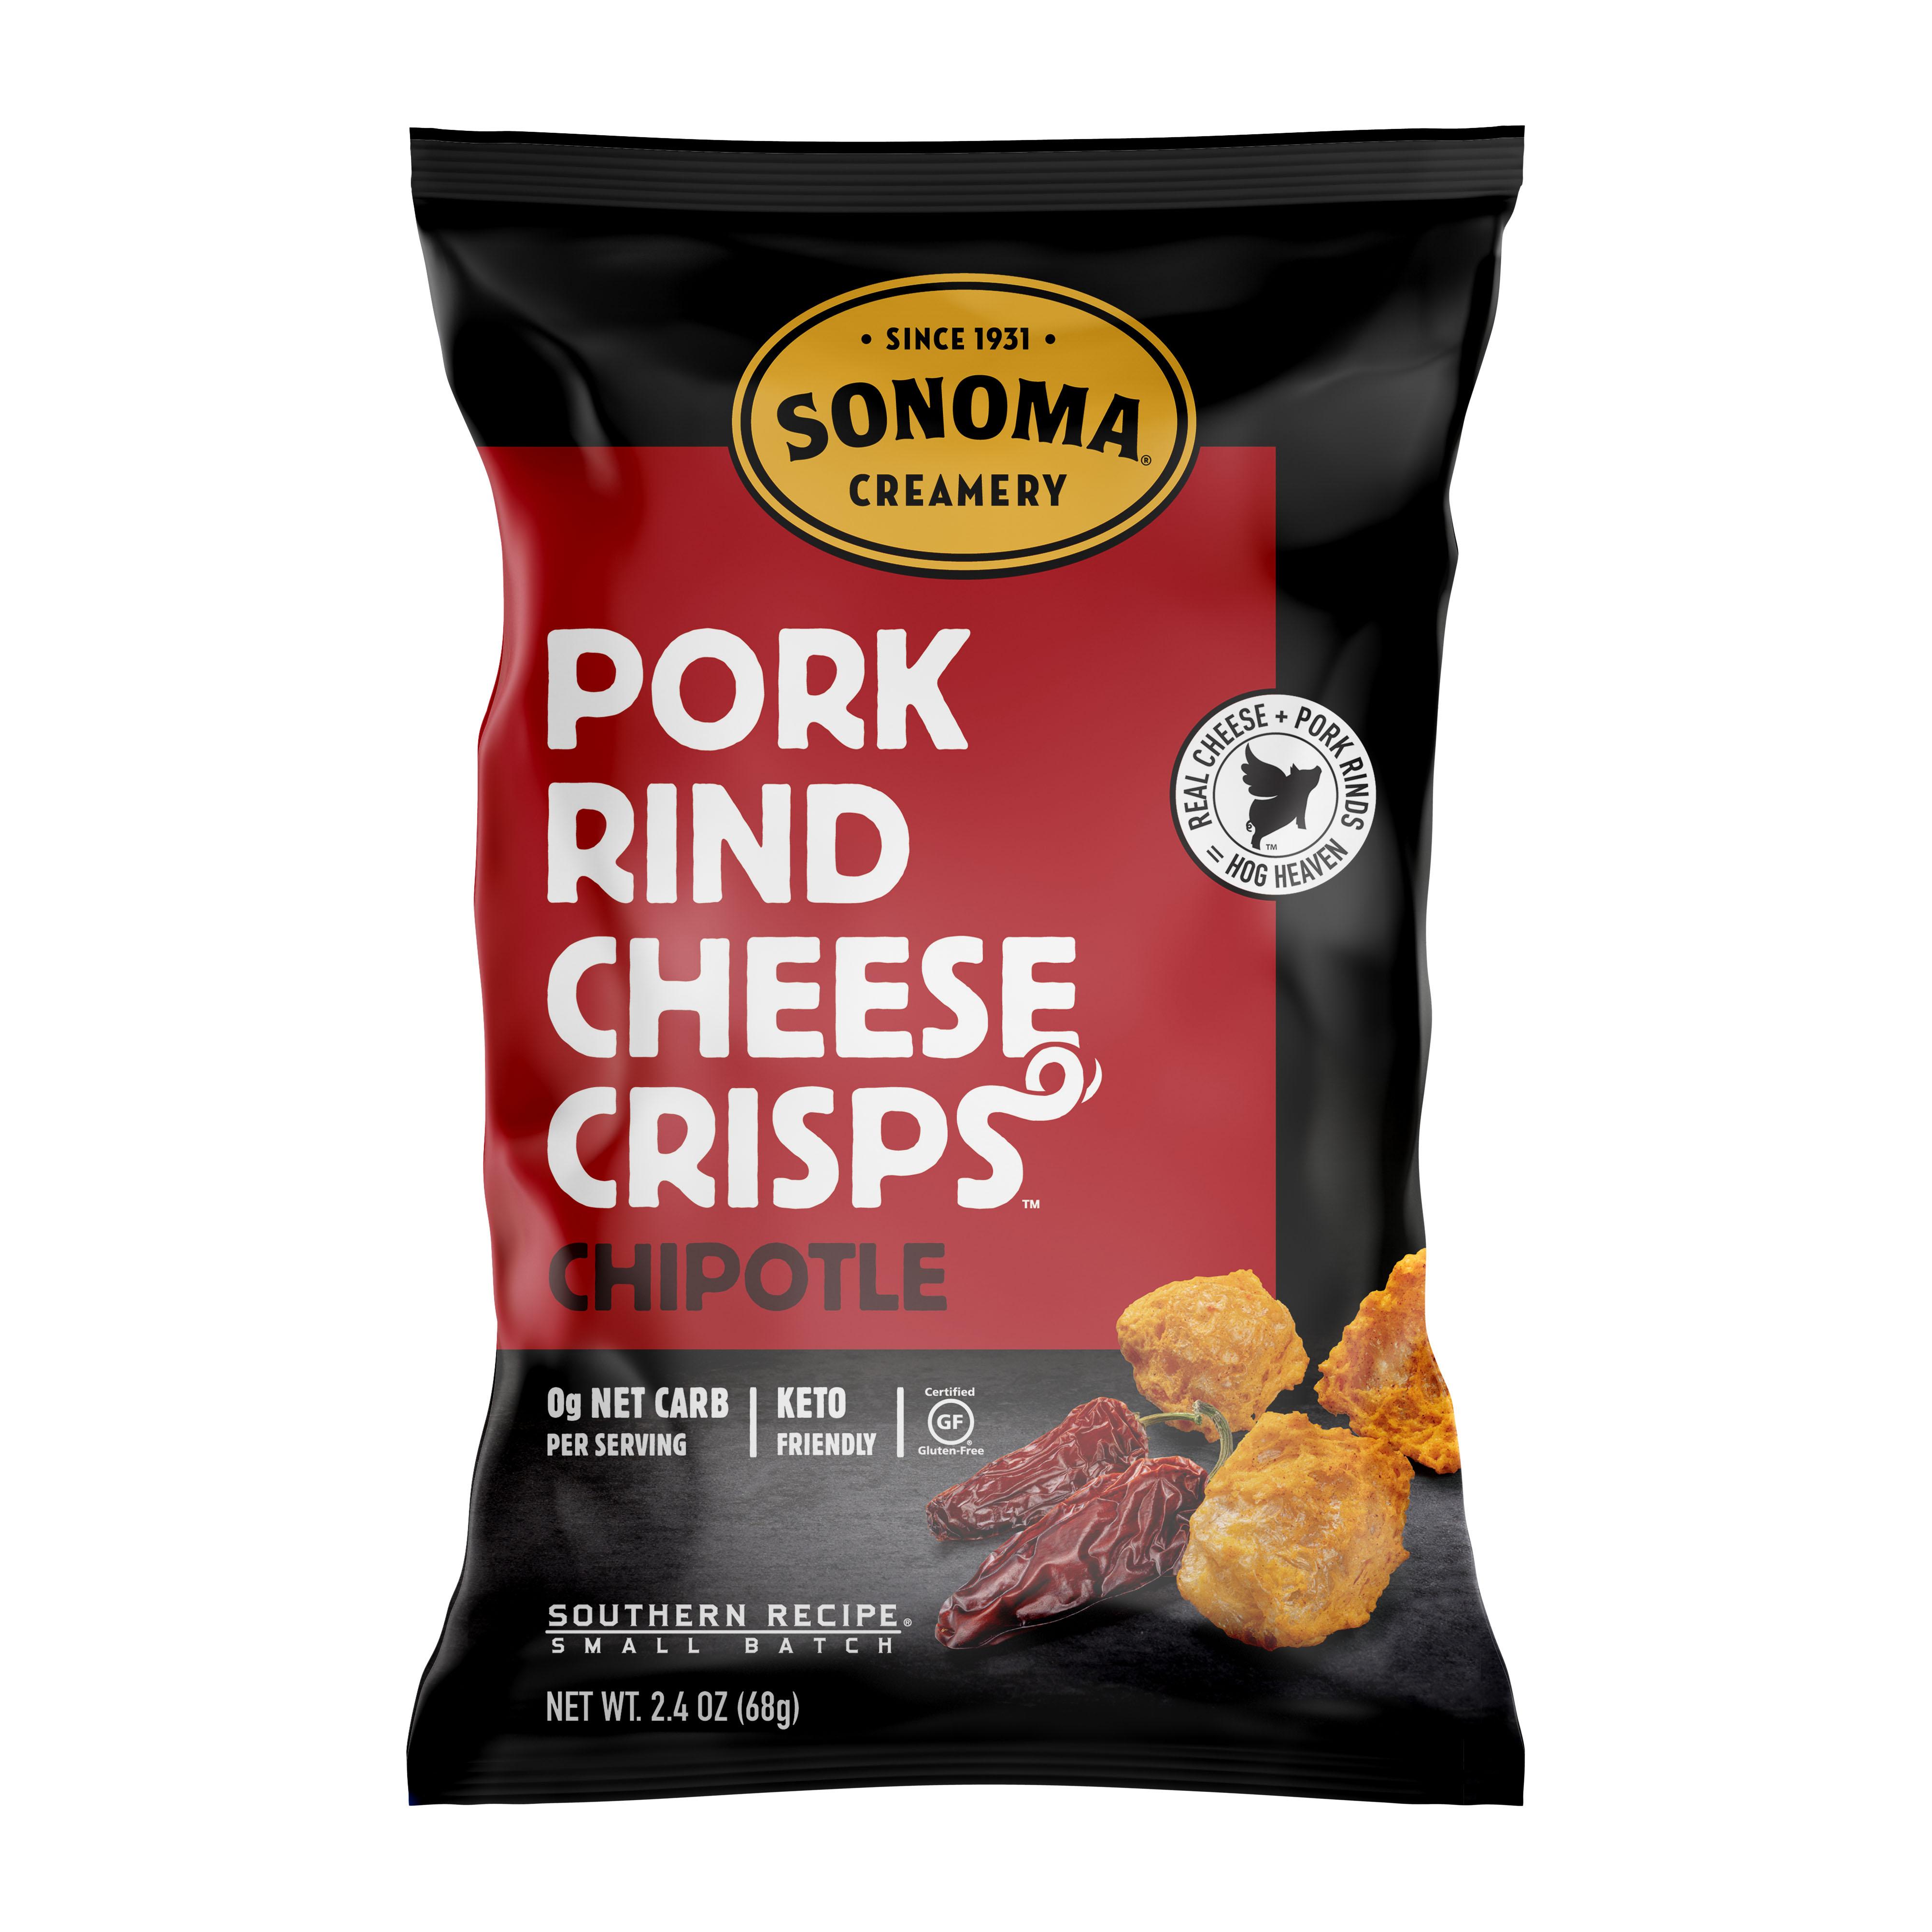 Pork Rind Cheese Crisps/Chipotle